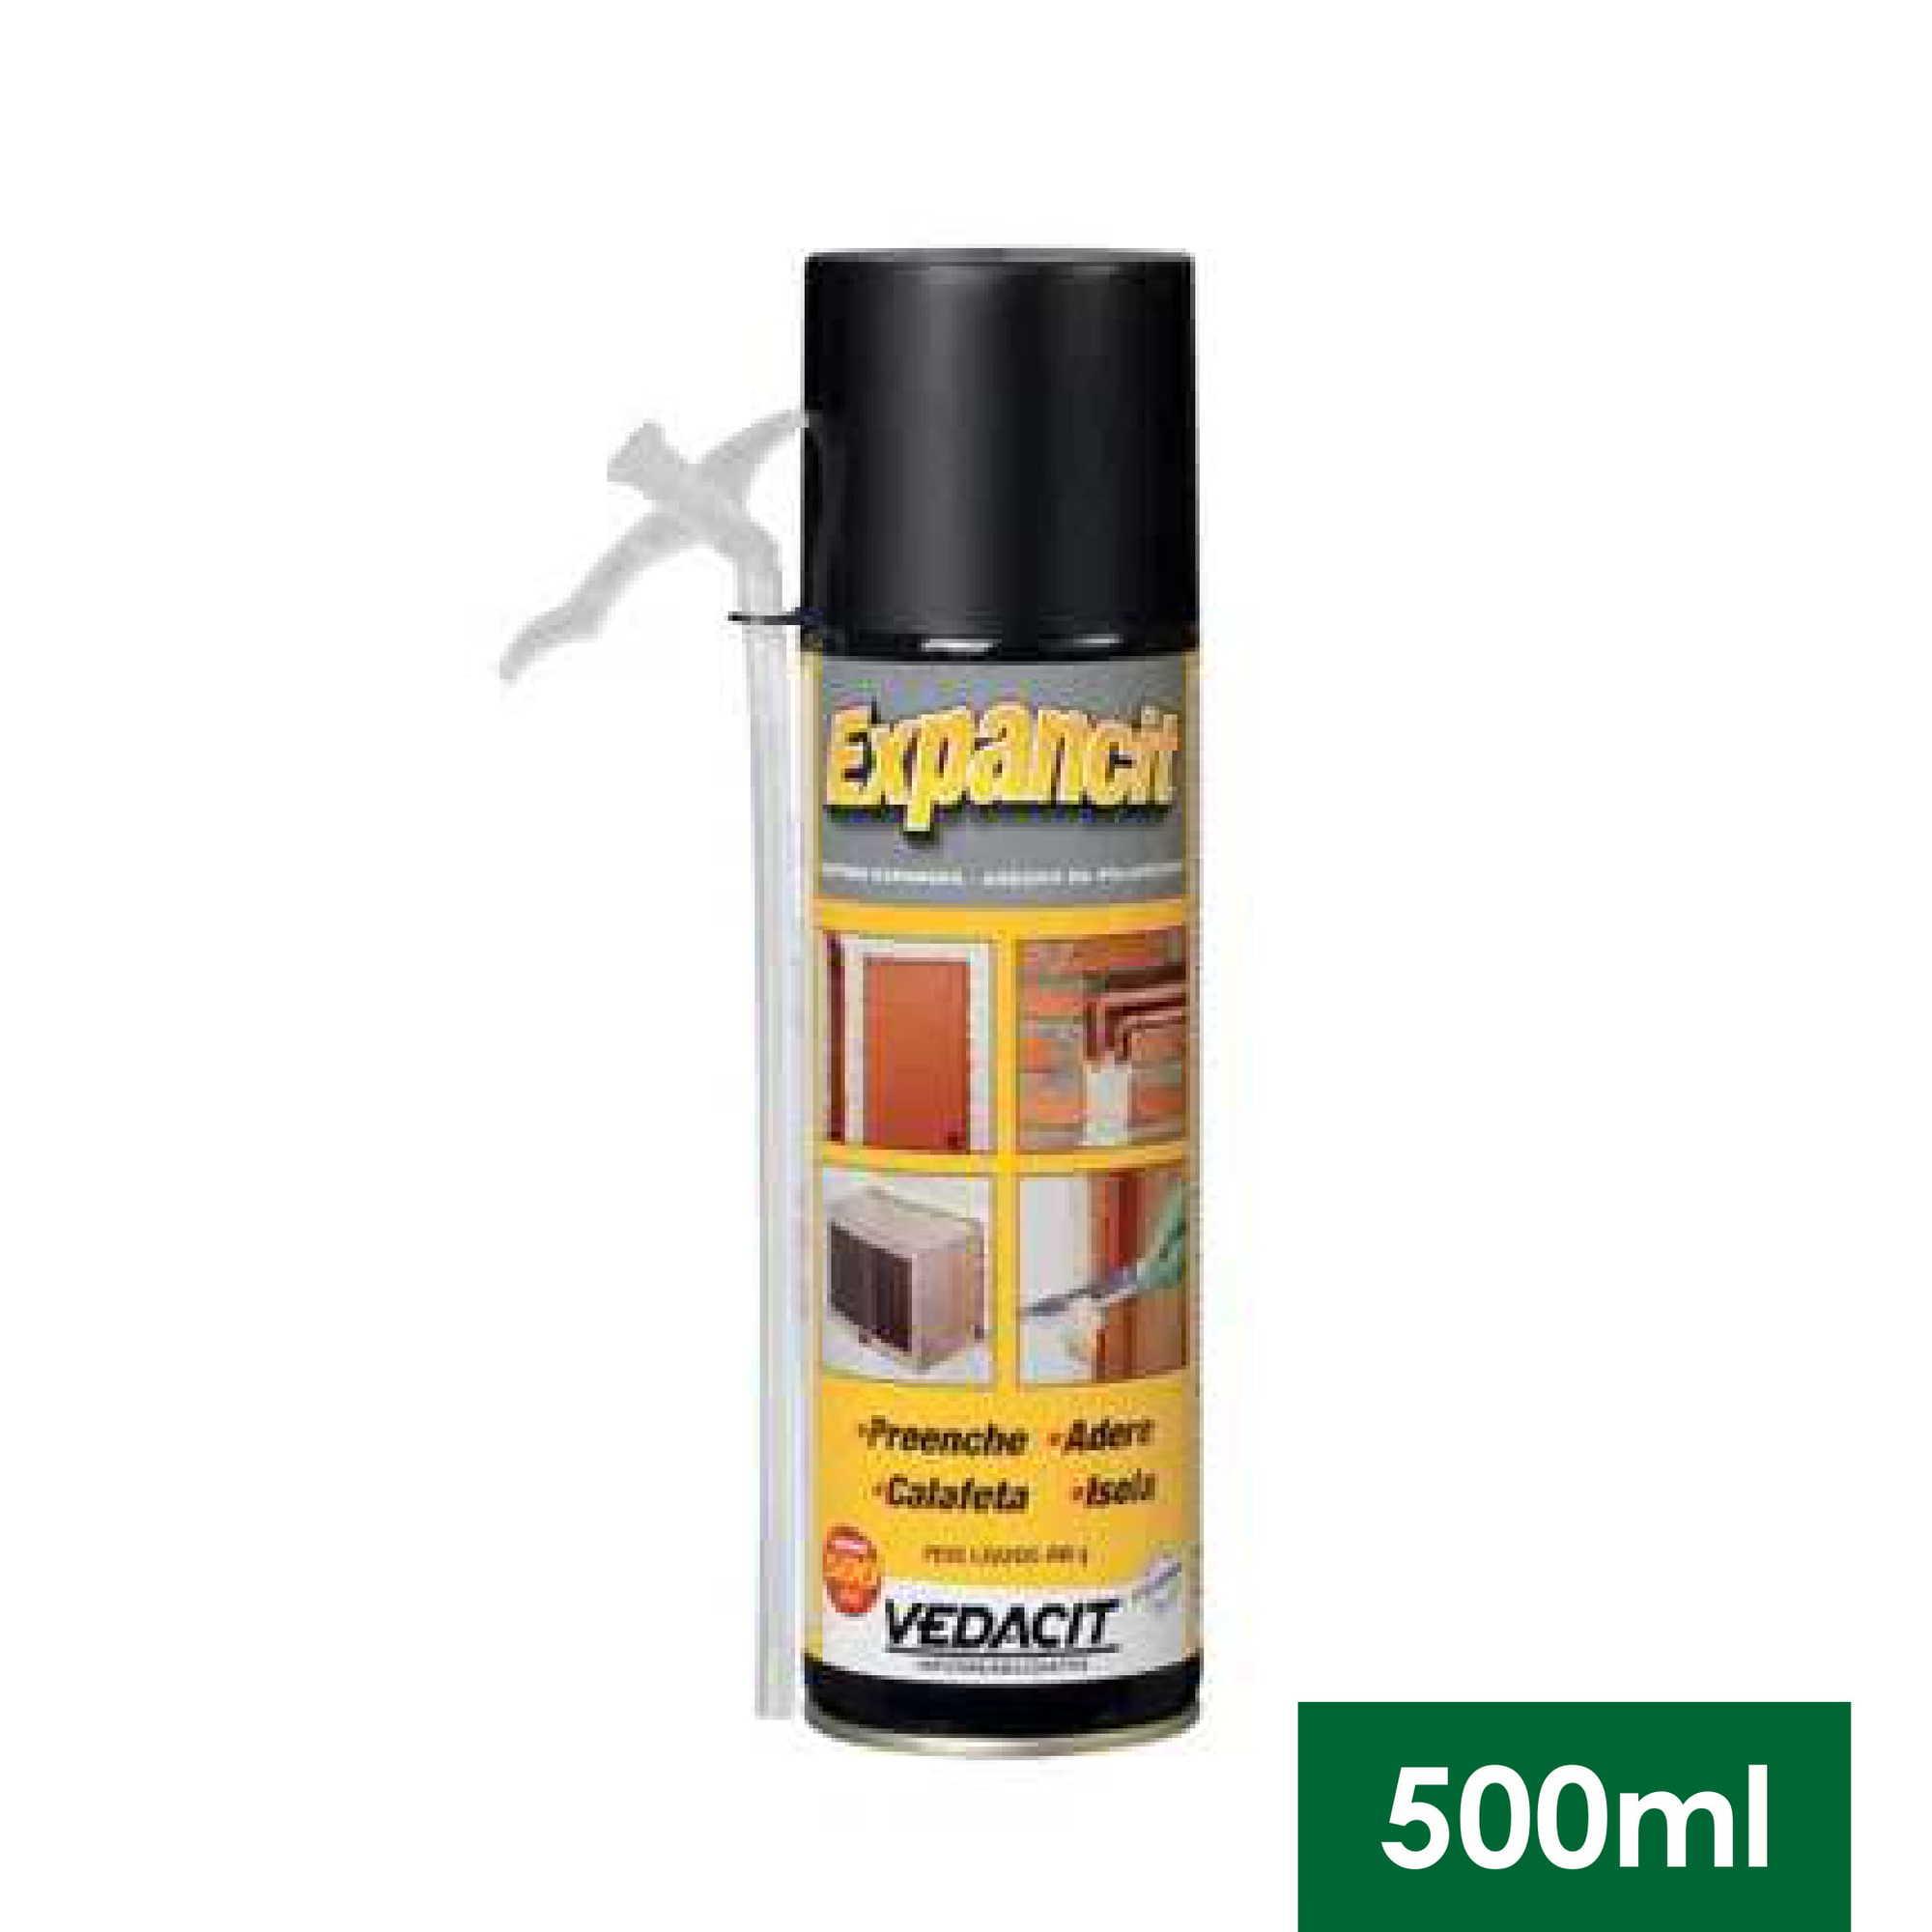 EXPANCIT AEROSSOL 500 ML